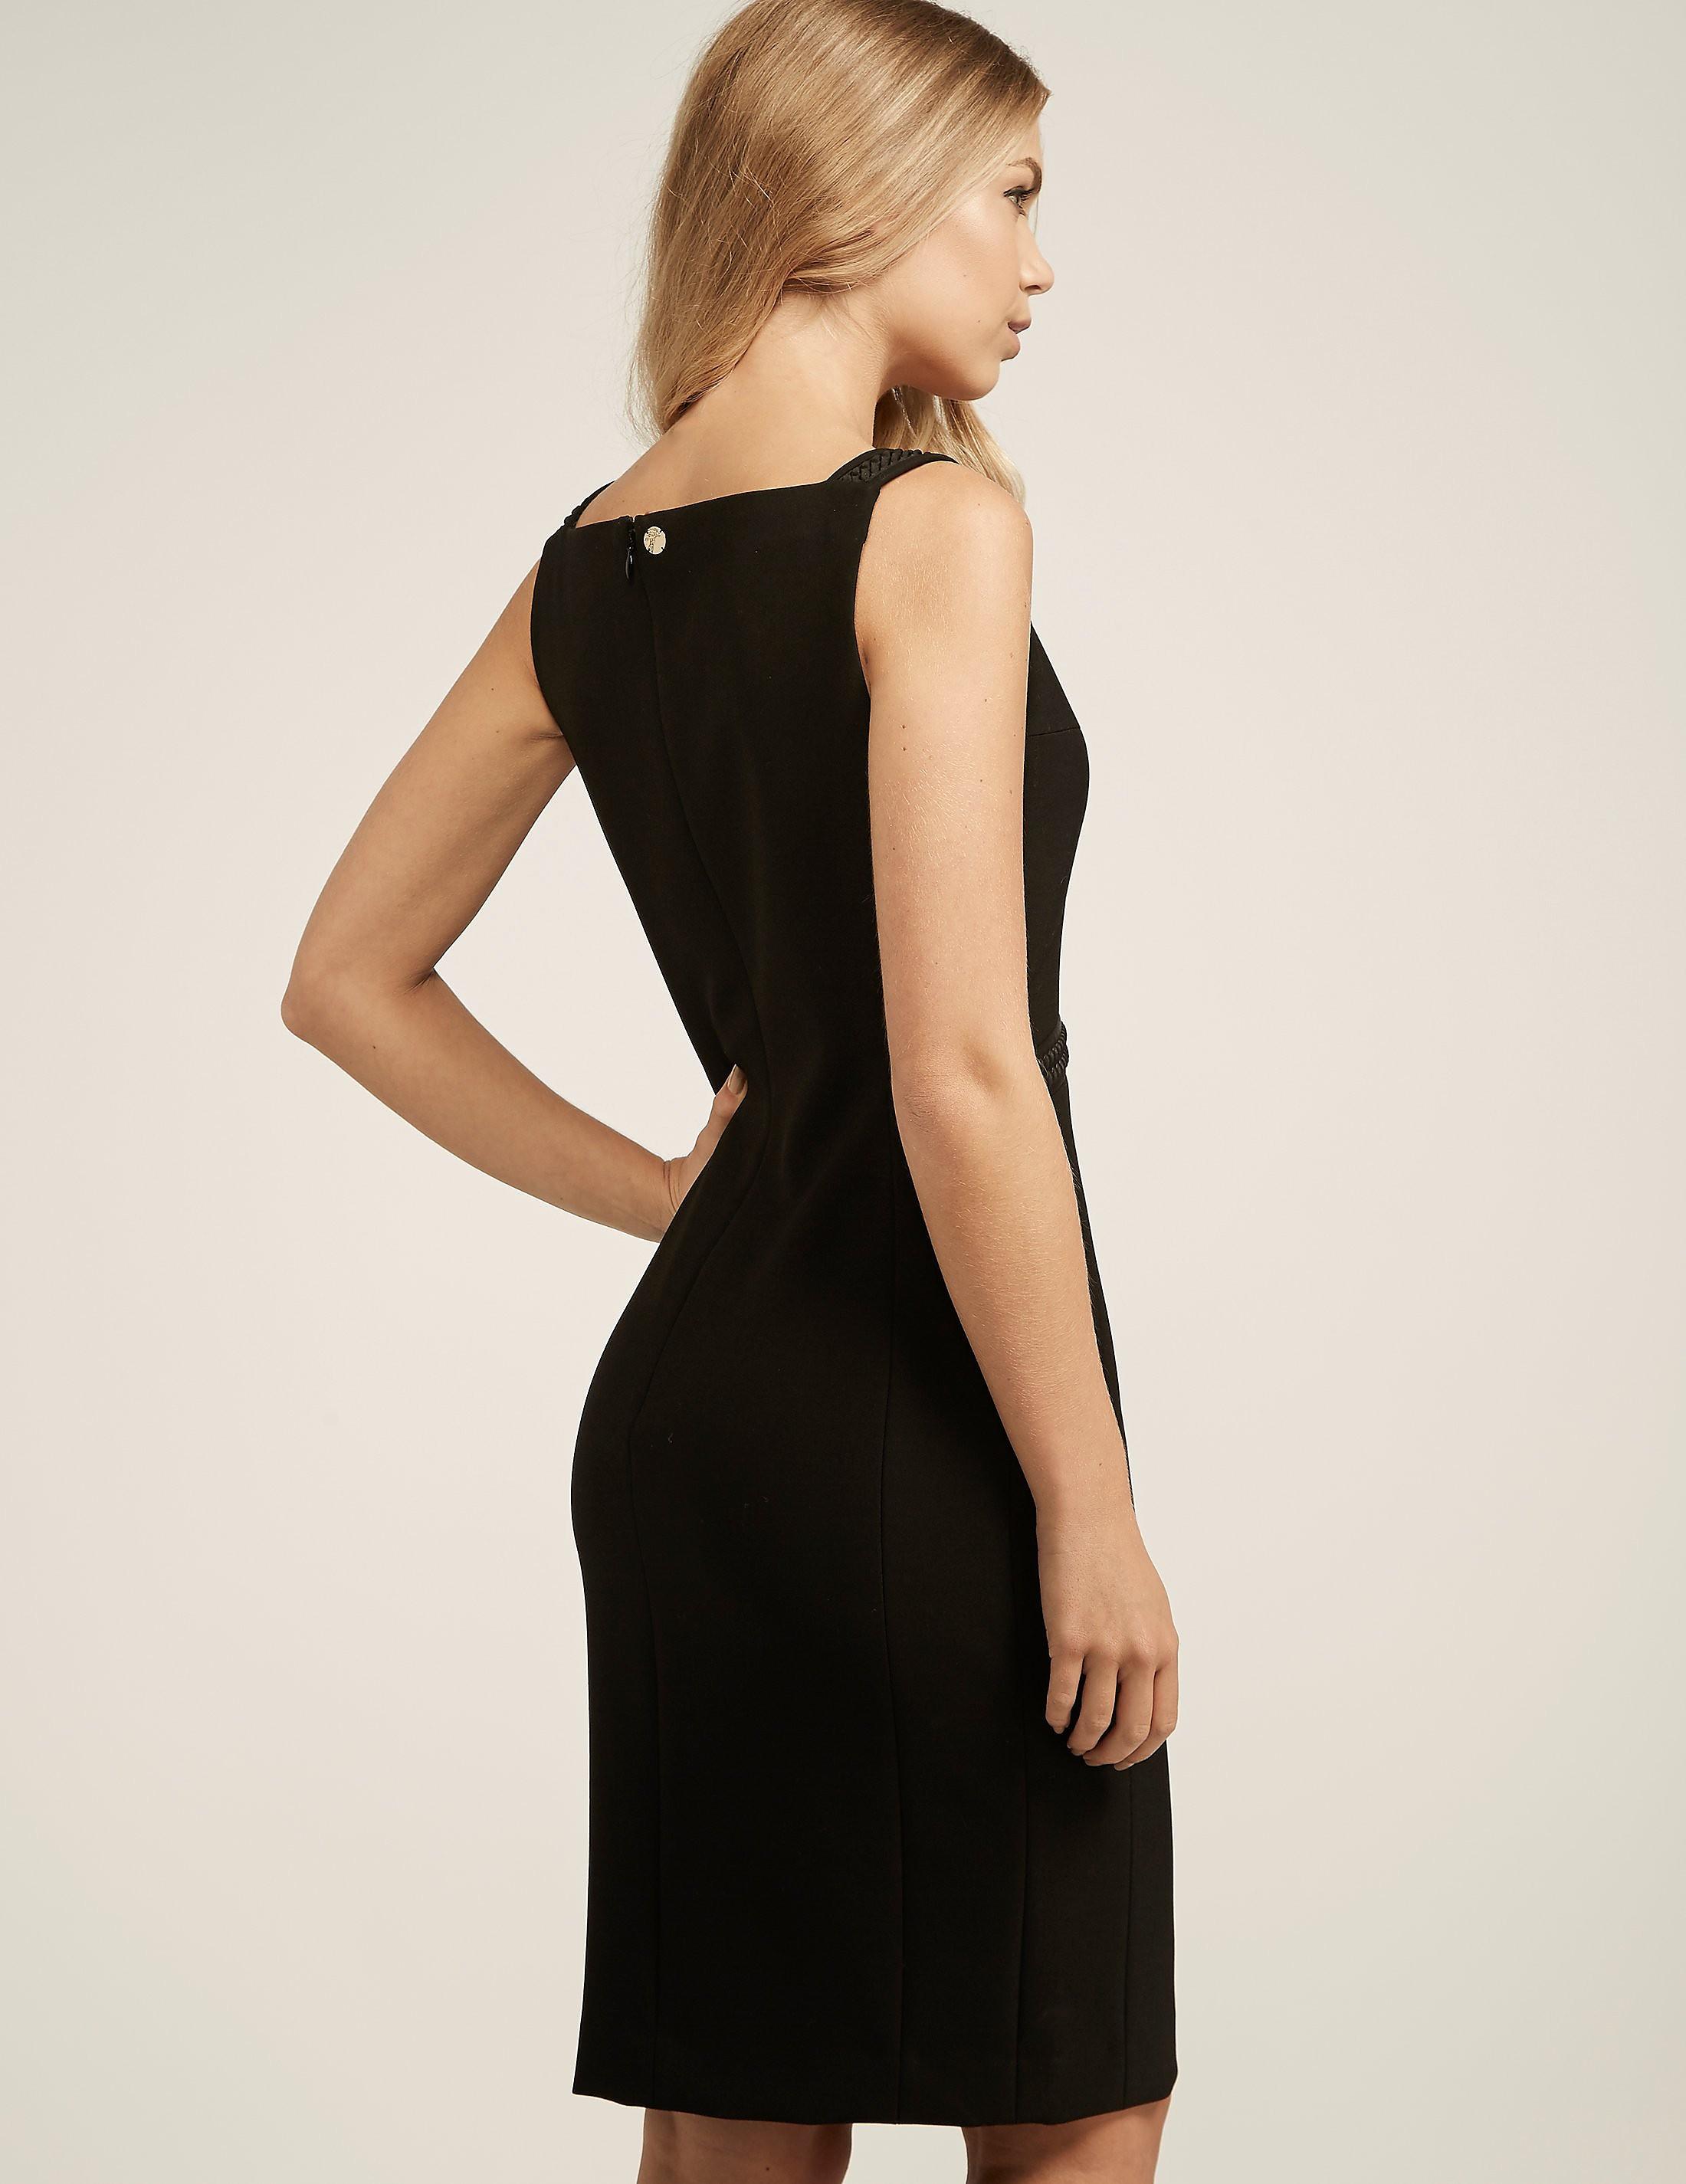 Versus Versace Trim Detail Dress